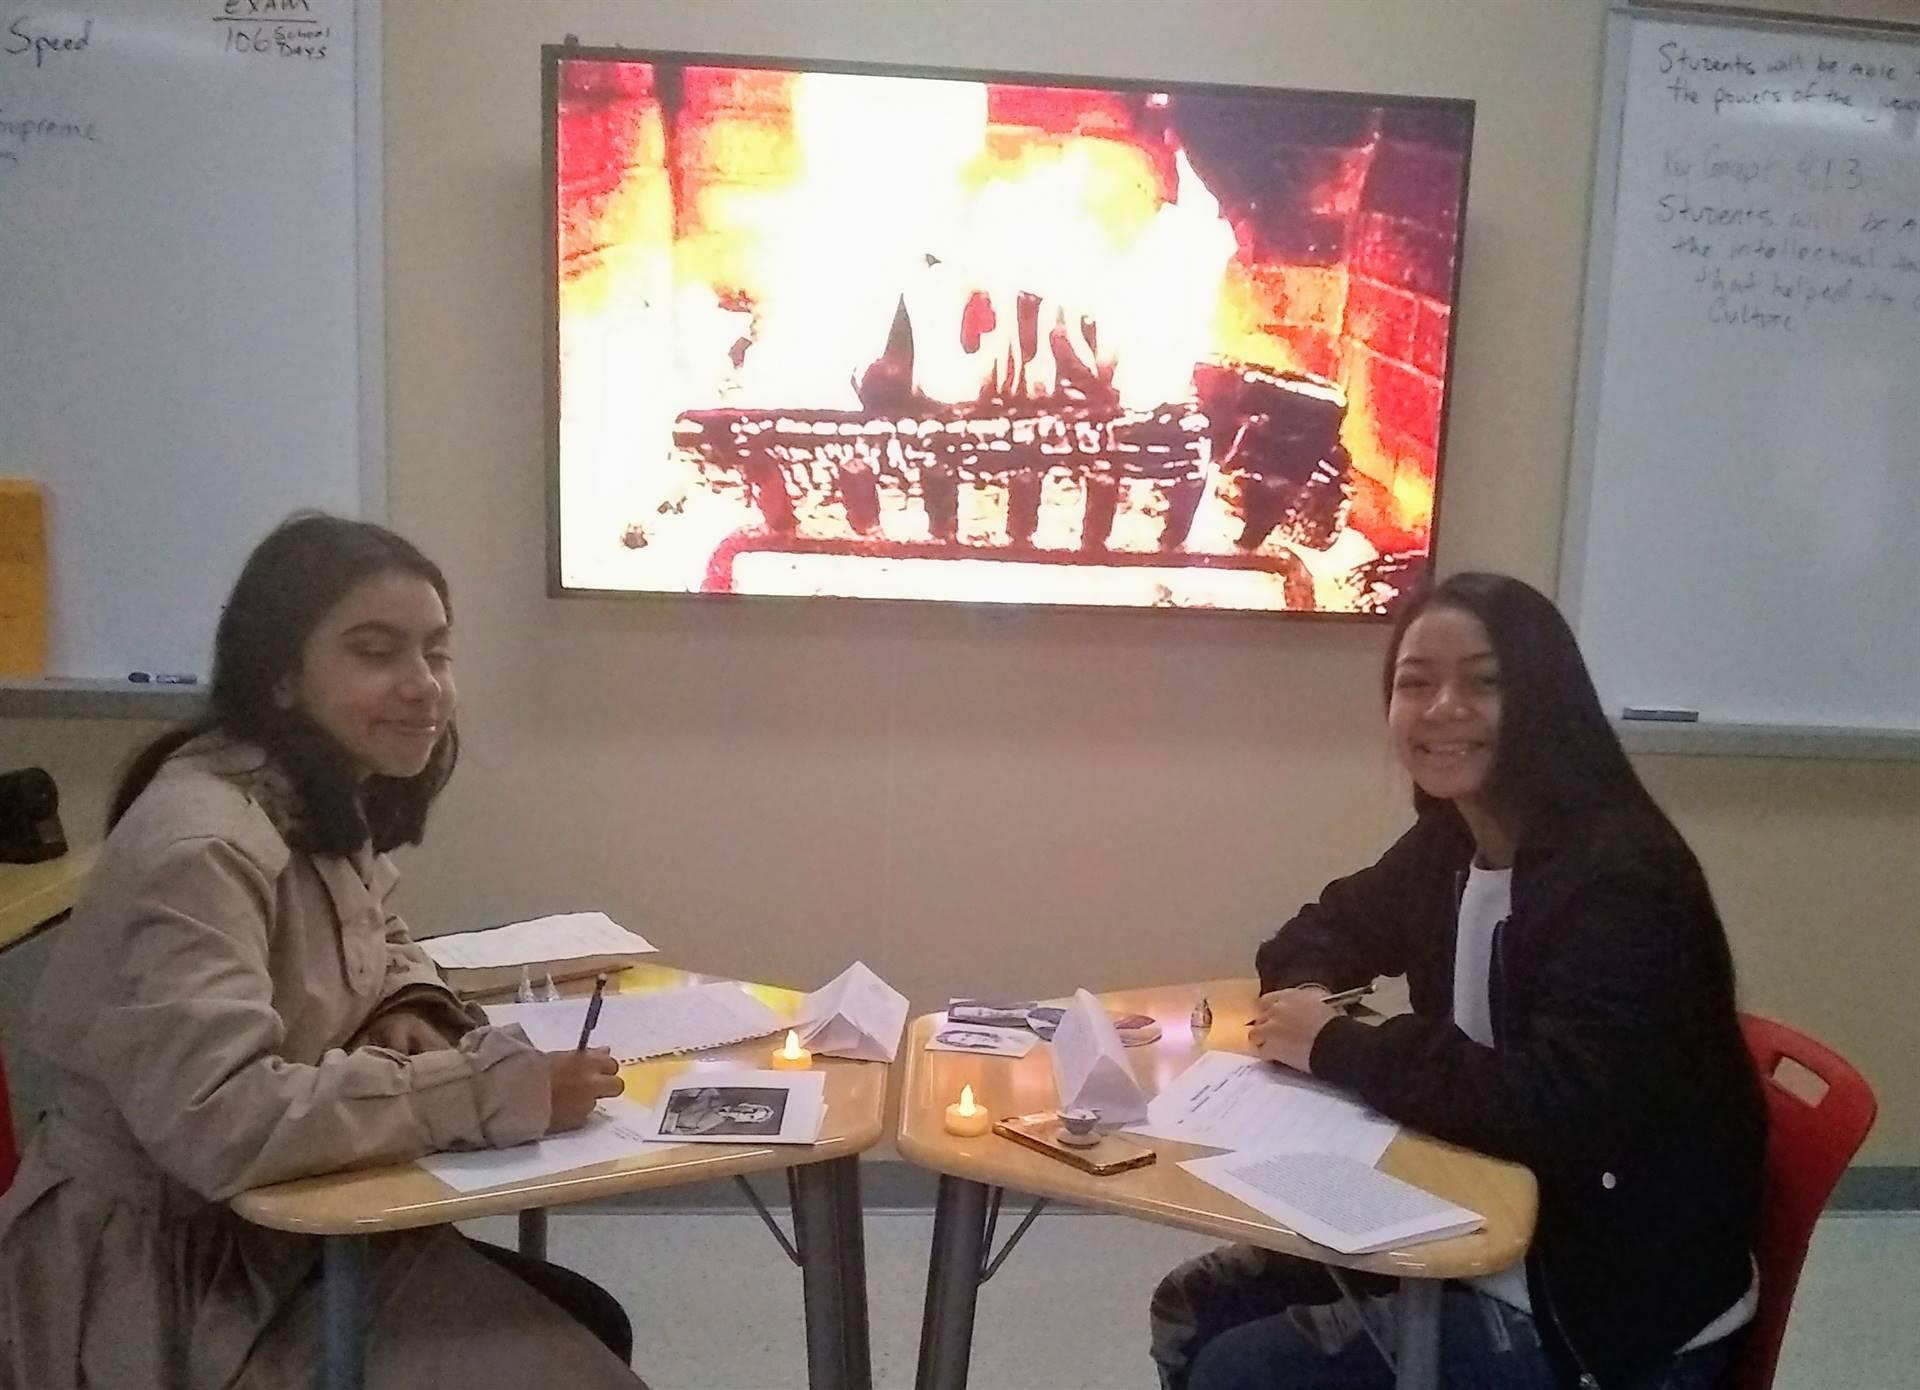 APUSH Students